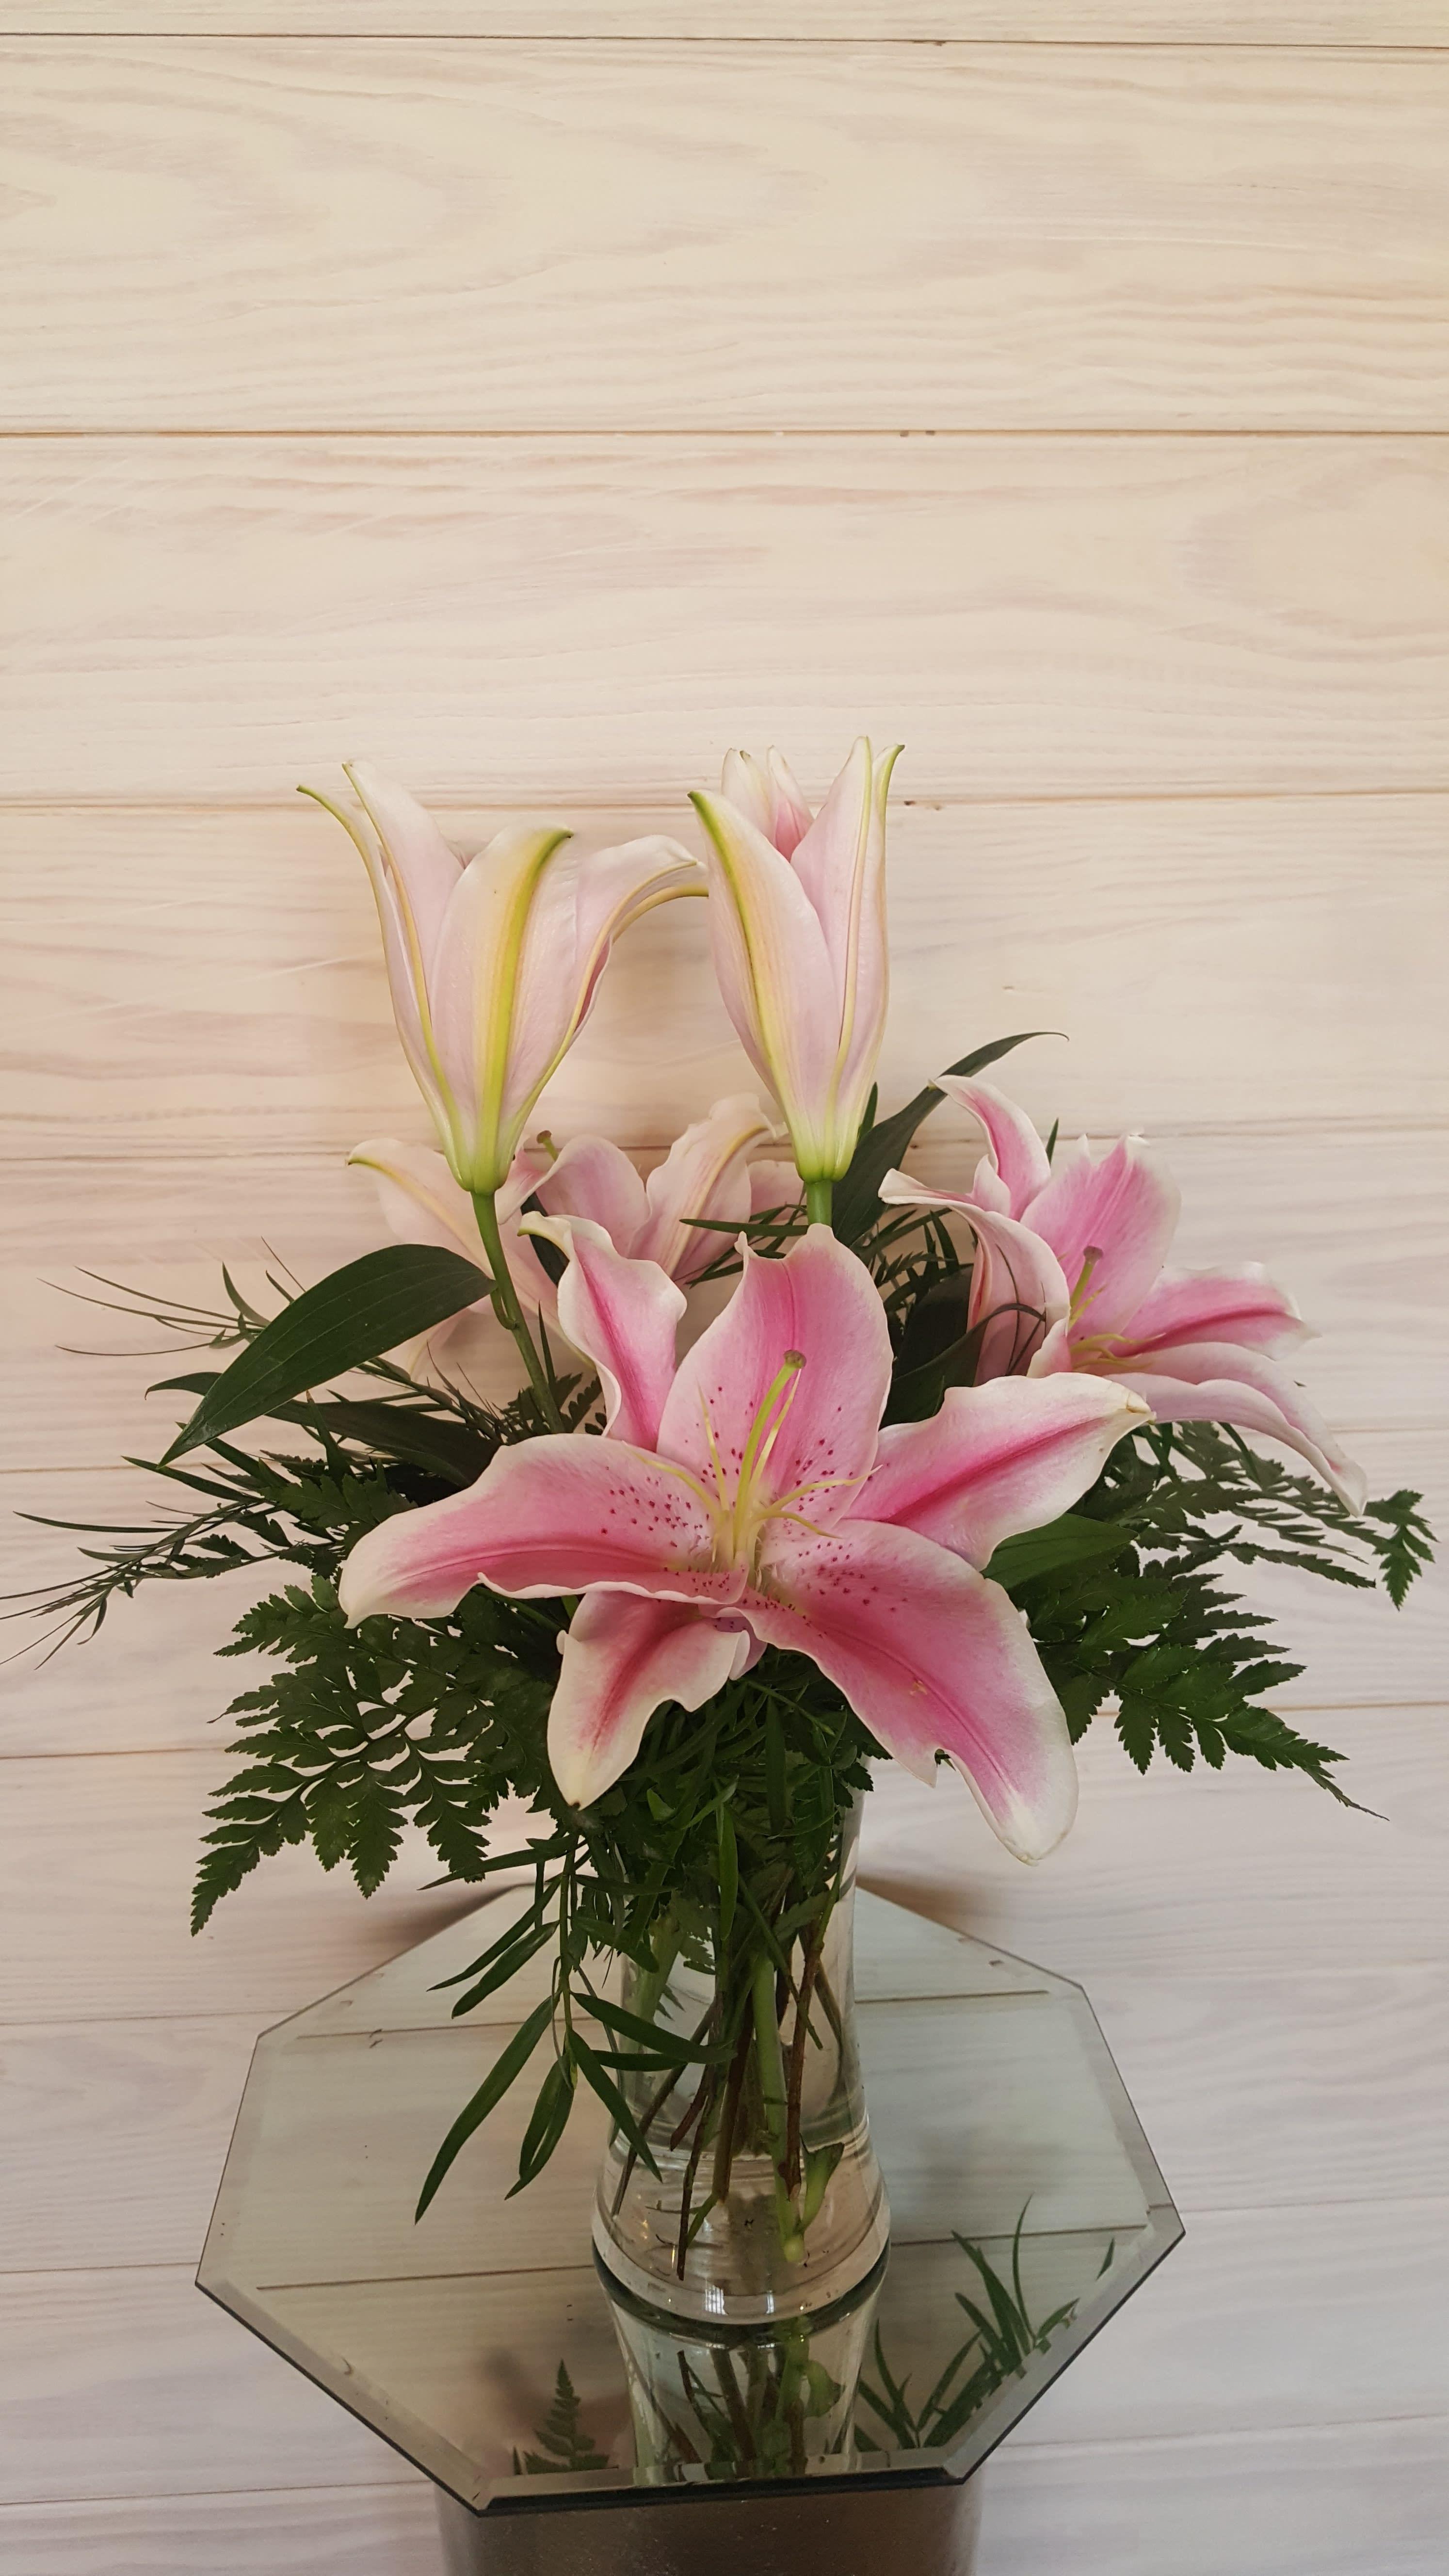 Lillies for Love in Decatur, AL | Simpson's Florist